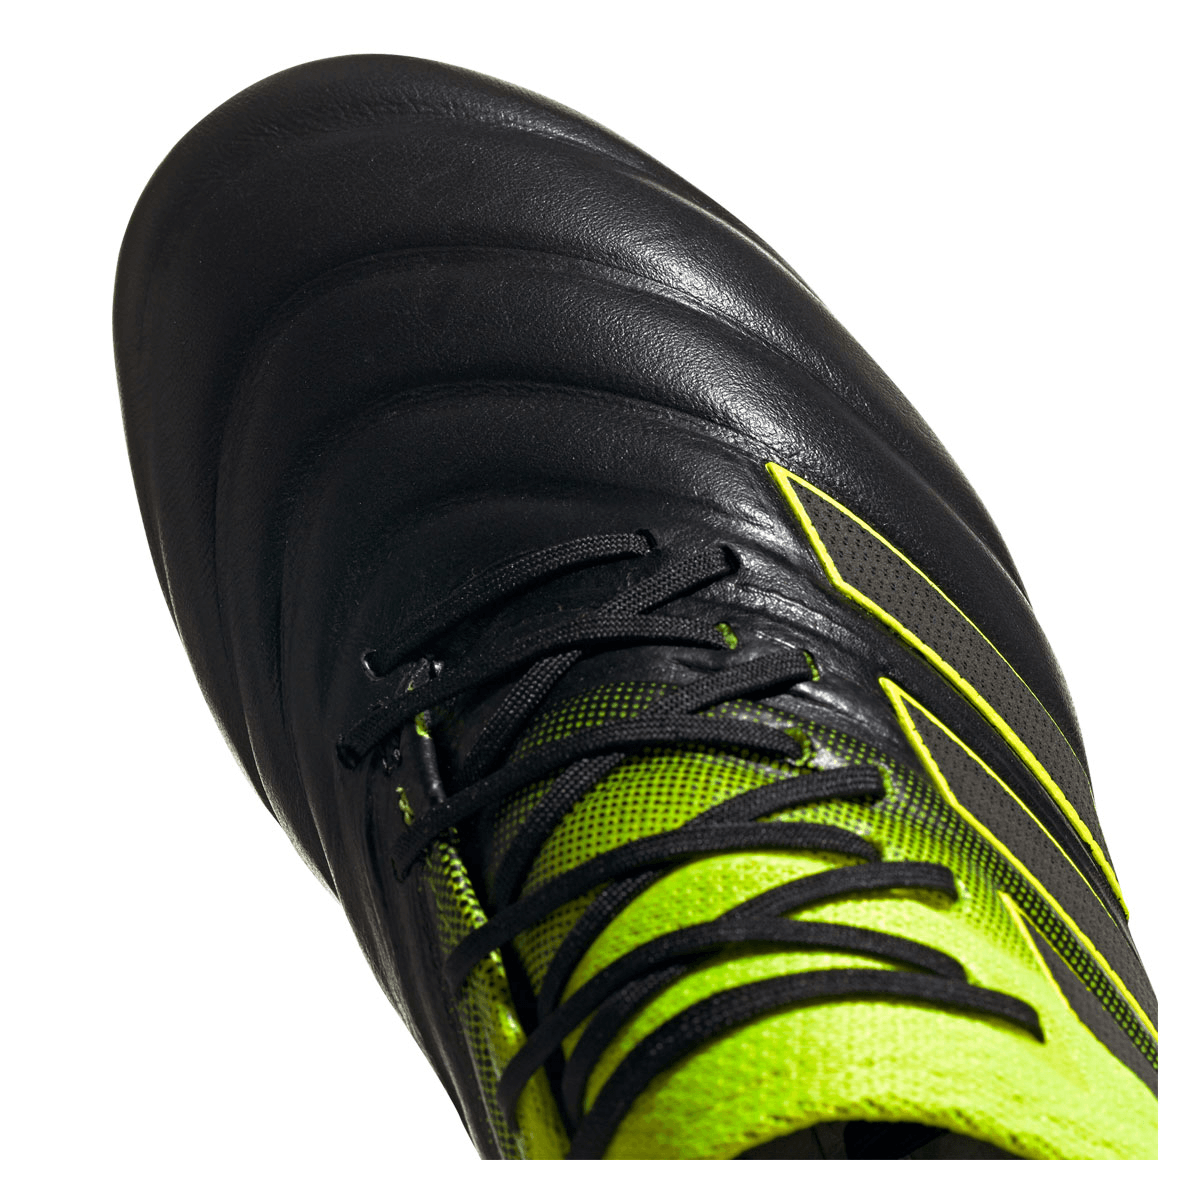 adidas katalog, Adidas Schuhe SchwarzGelb,adidas